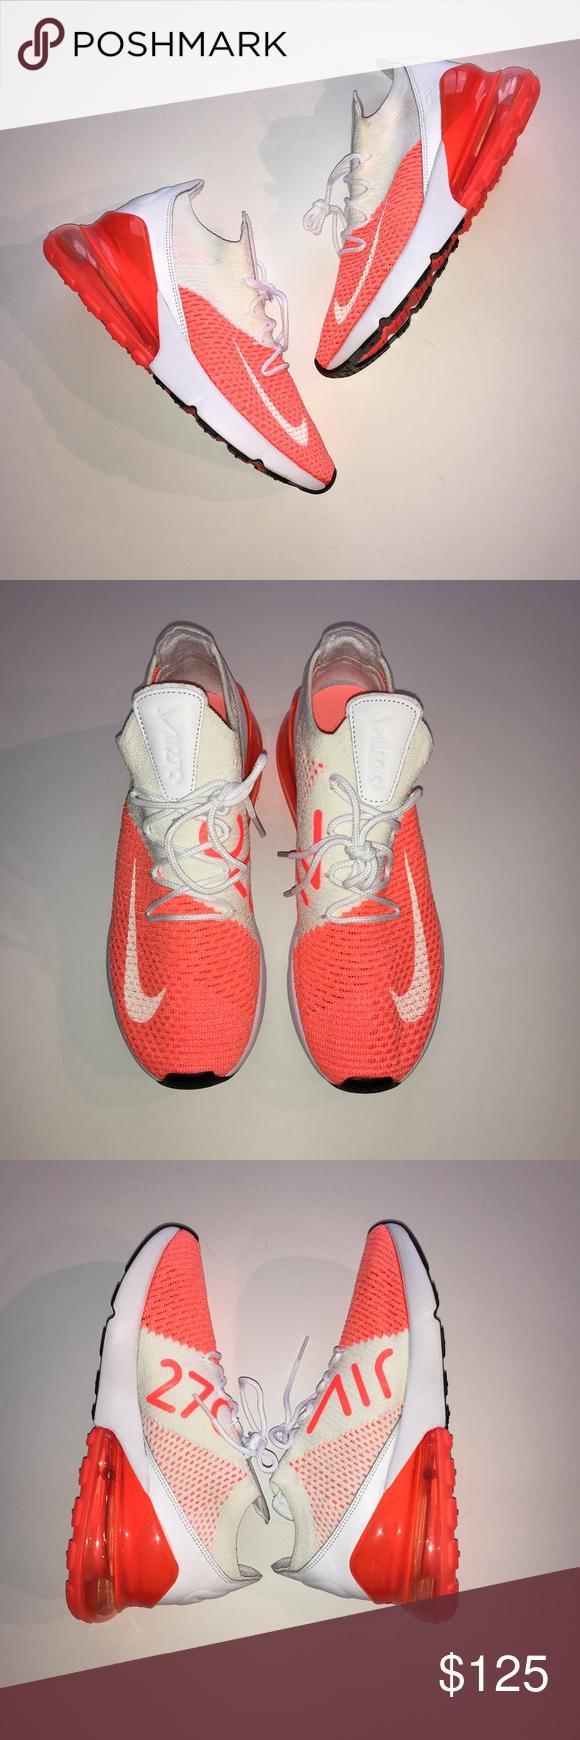 newest 31ea7 283fb Nike Air Max 270 Flyknit Crimson Pulse Sneakers Feel lighter ...